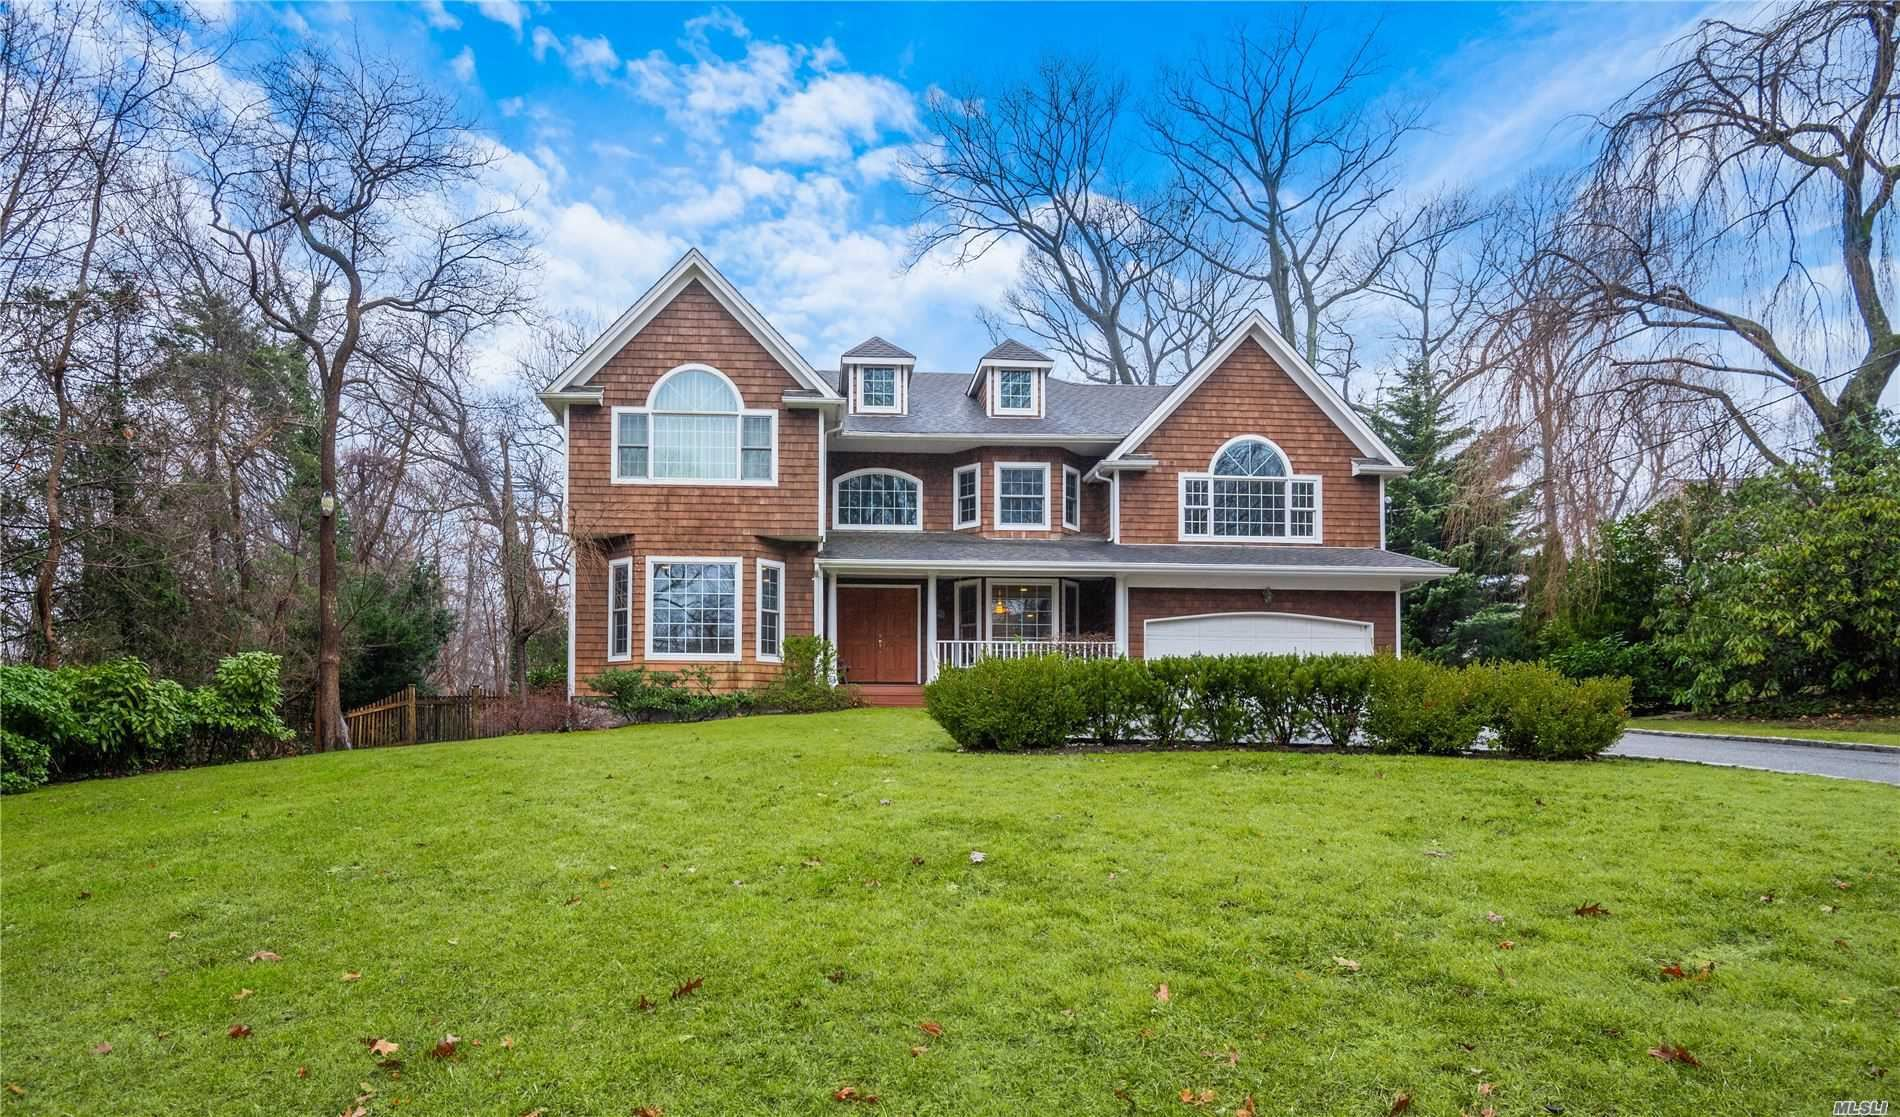 41 The Intervale, Roslyn Estates, NY 11576 - MLS#: 3200728